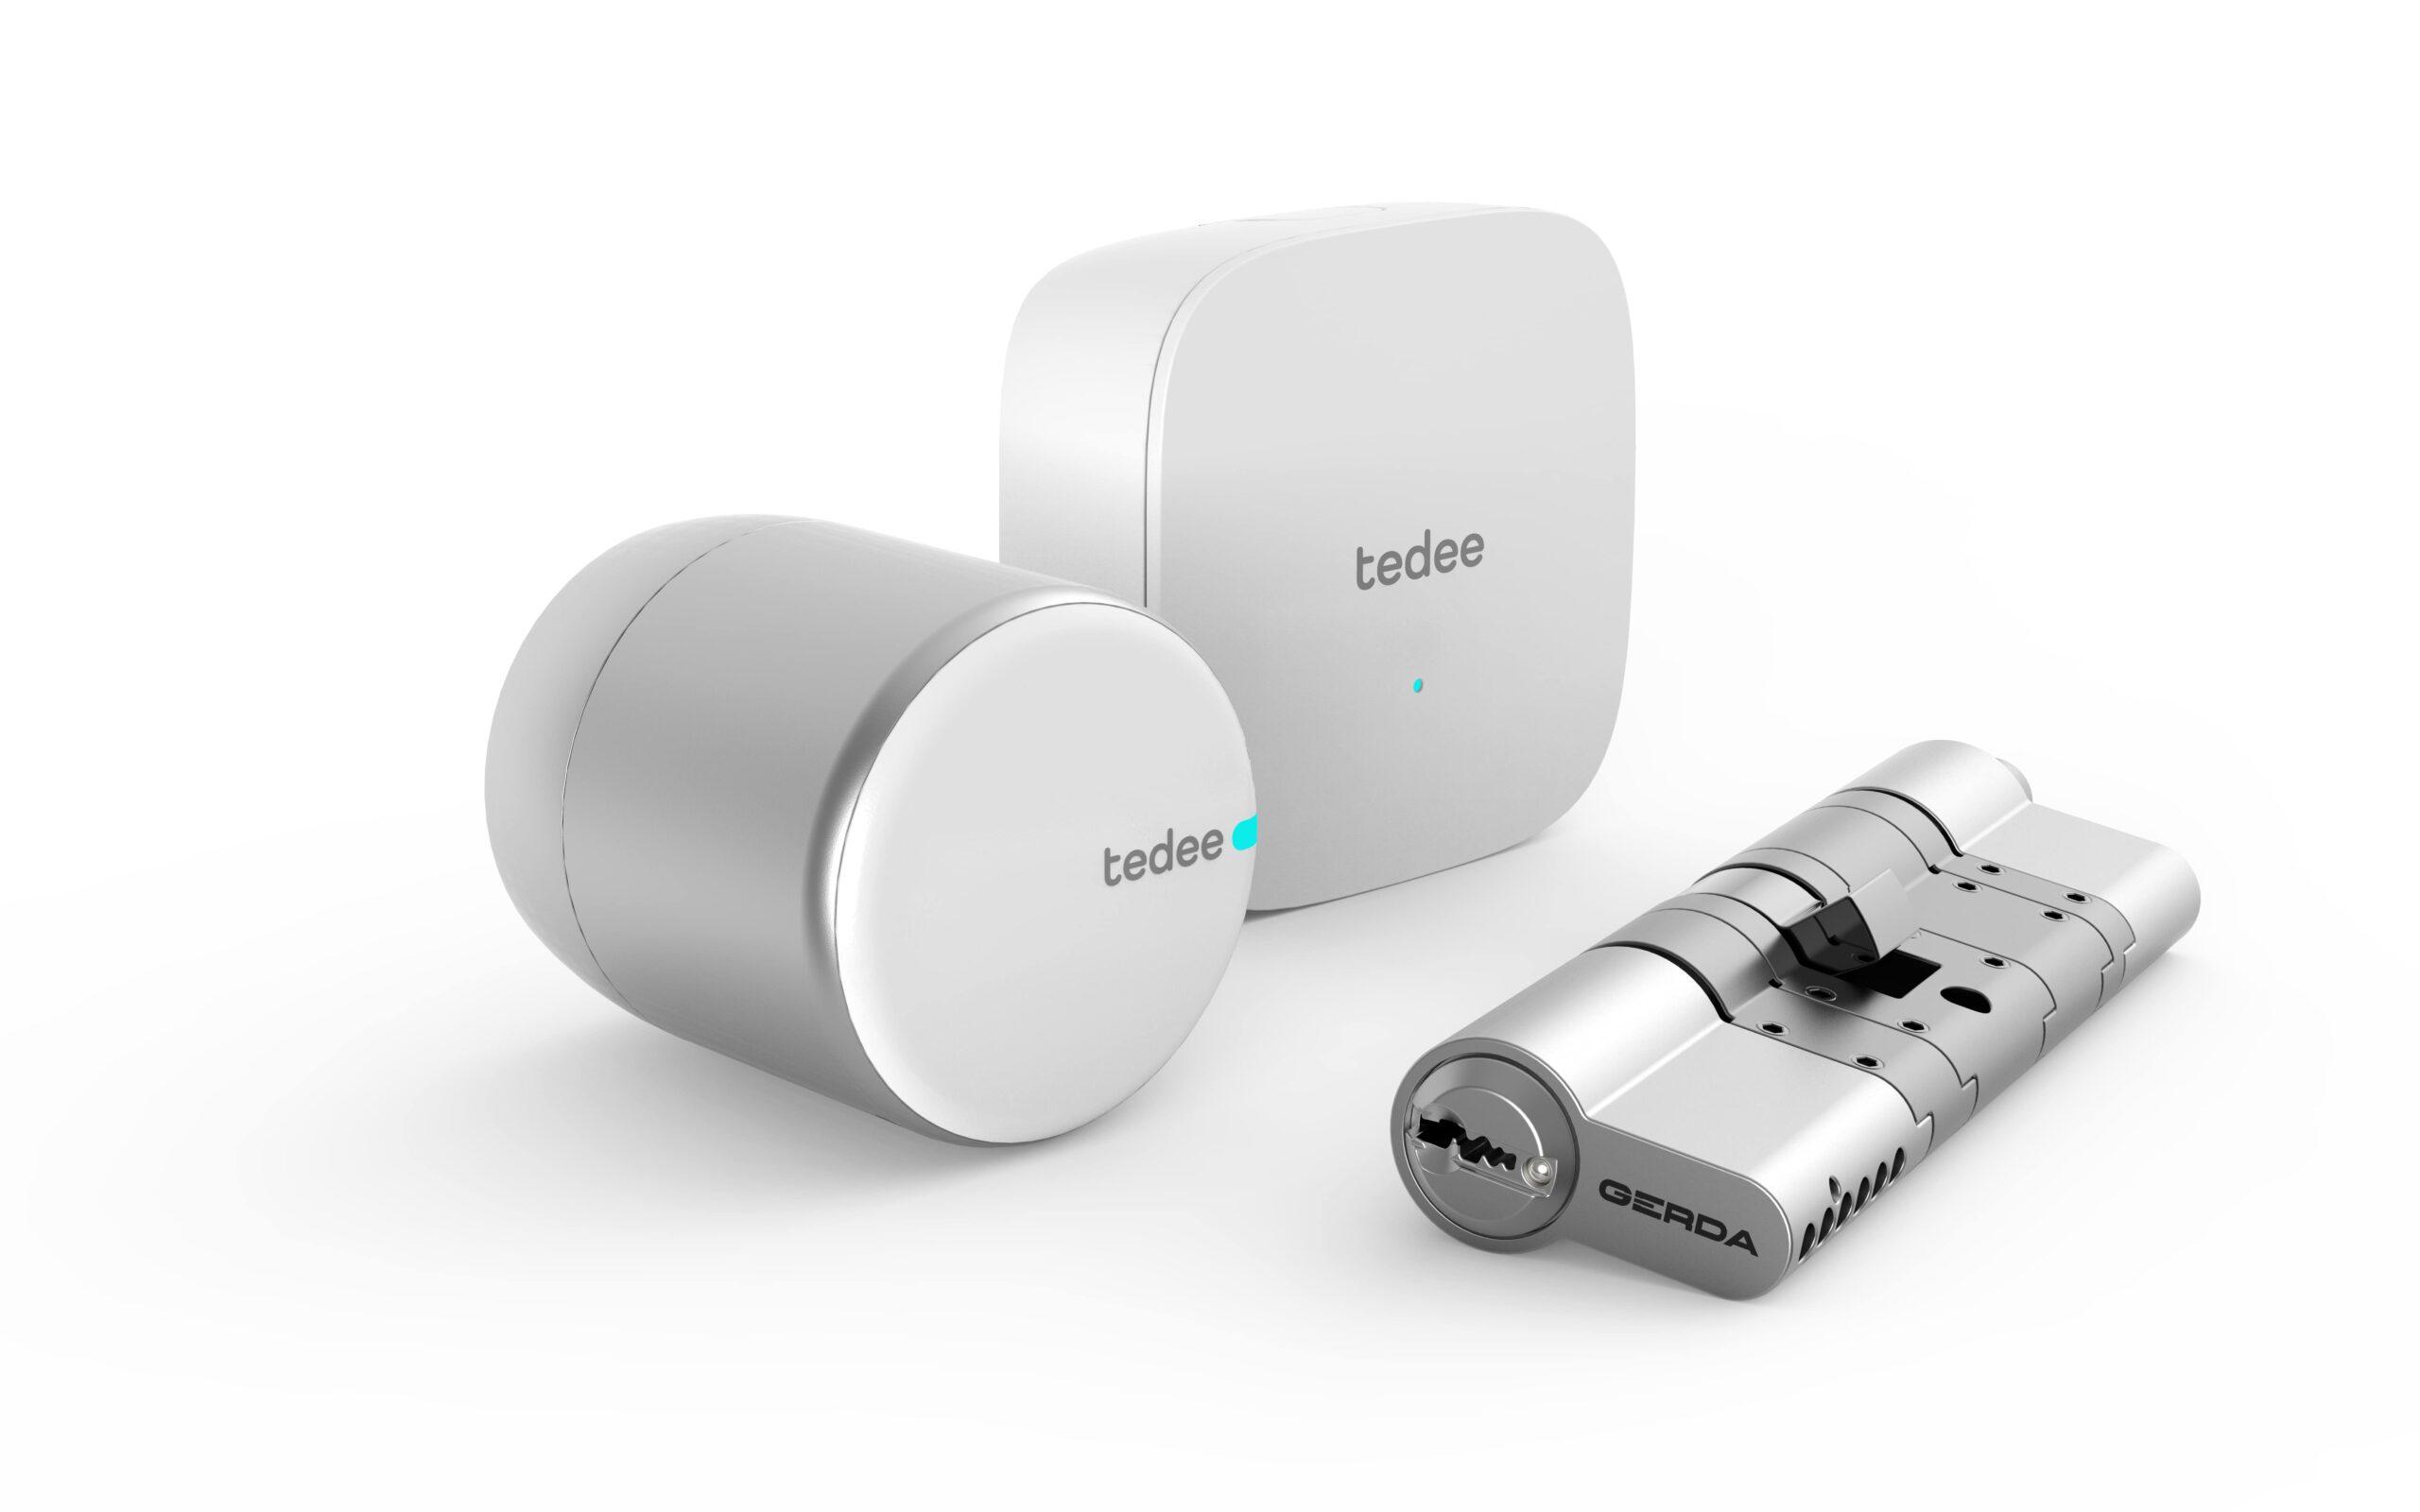 Tedee by gerda electronic lock